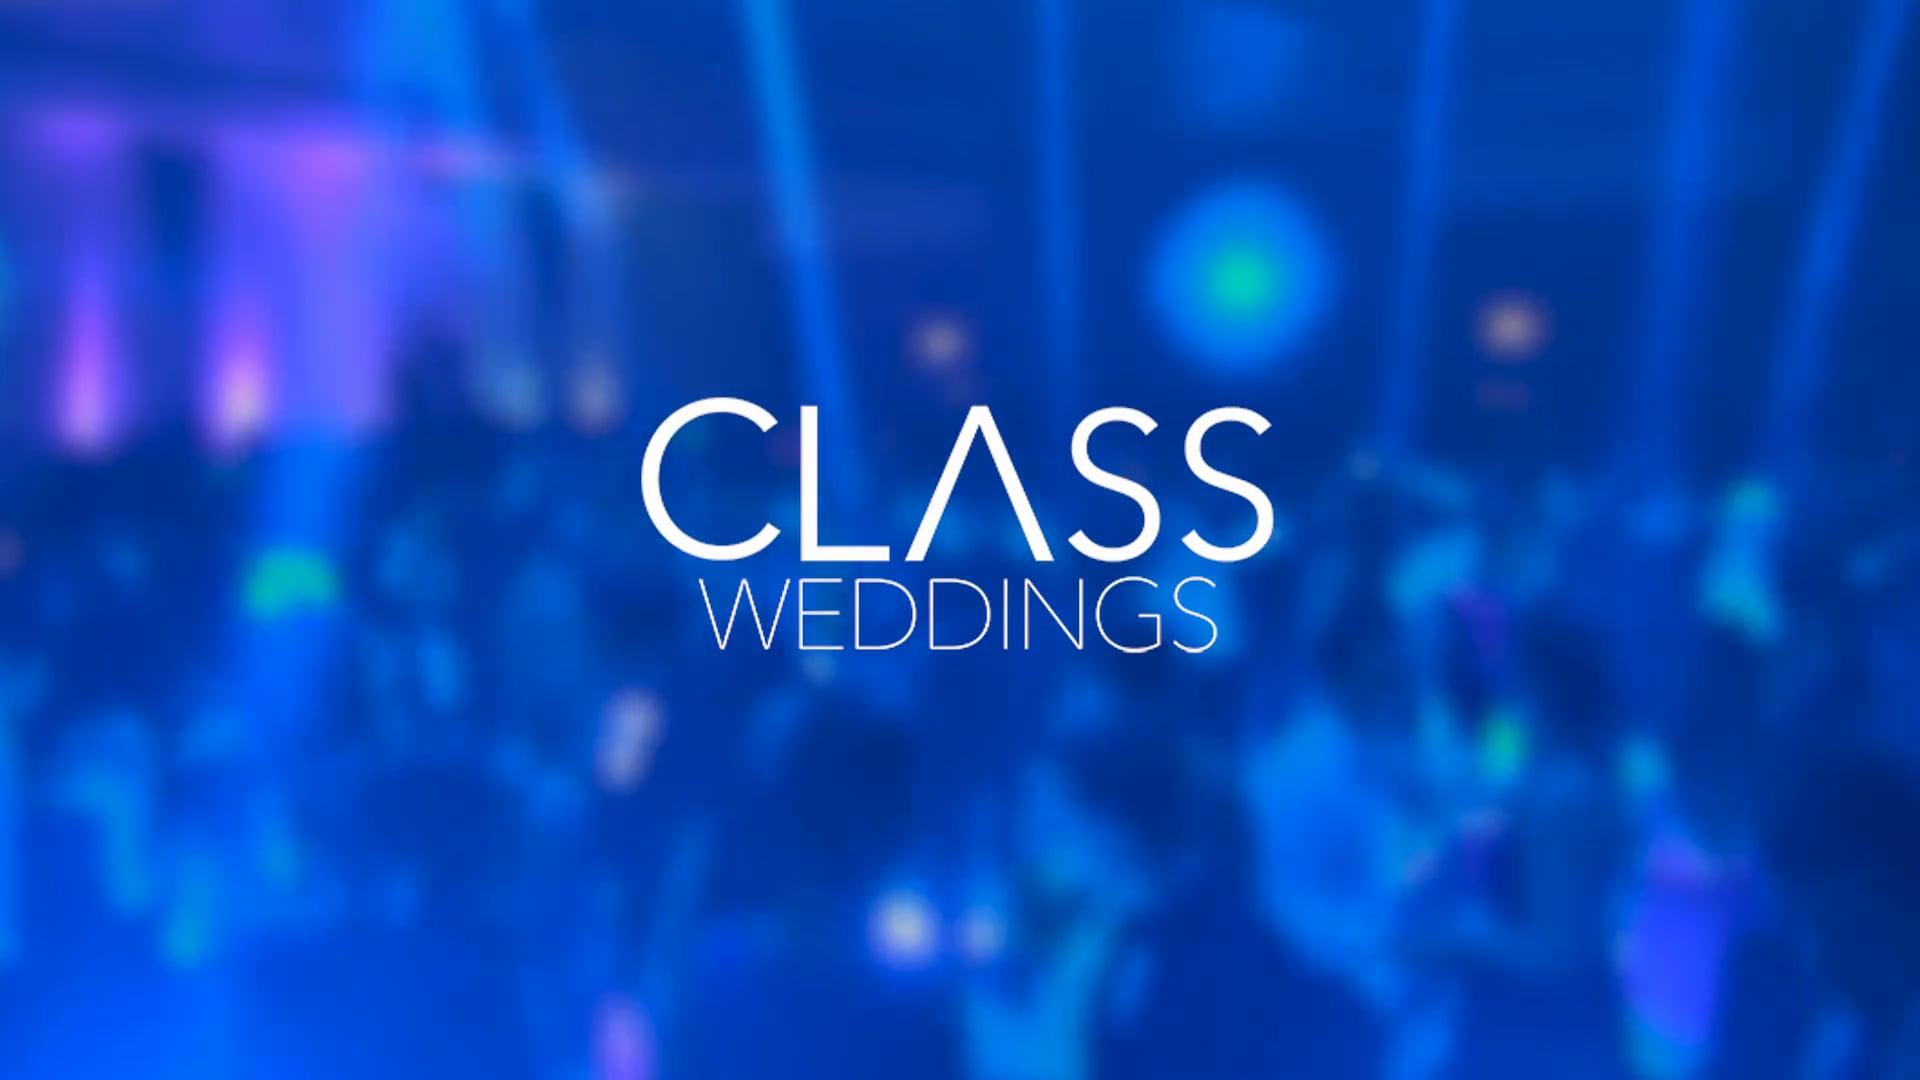 Class Wedding